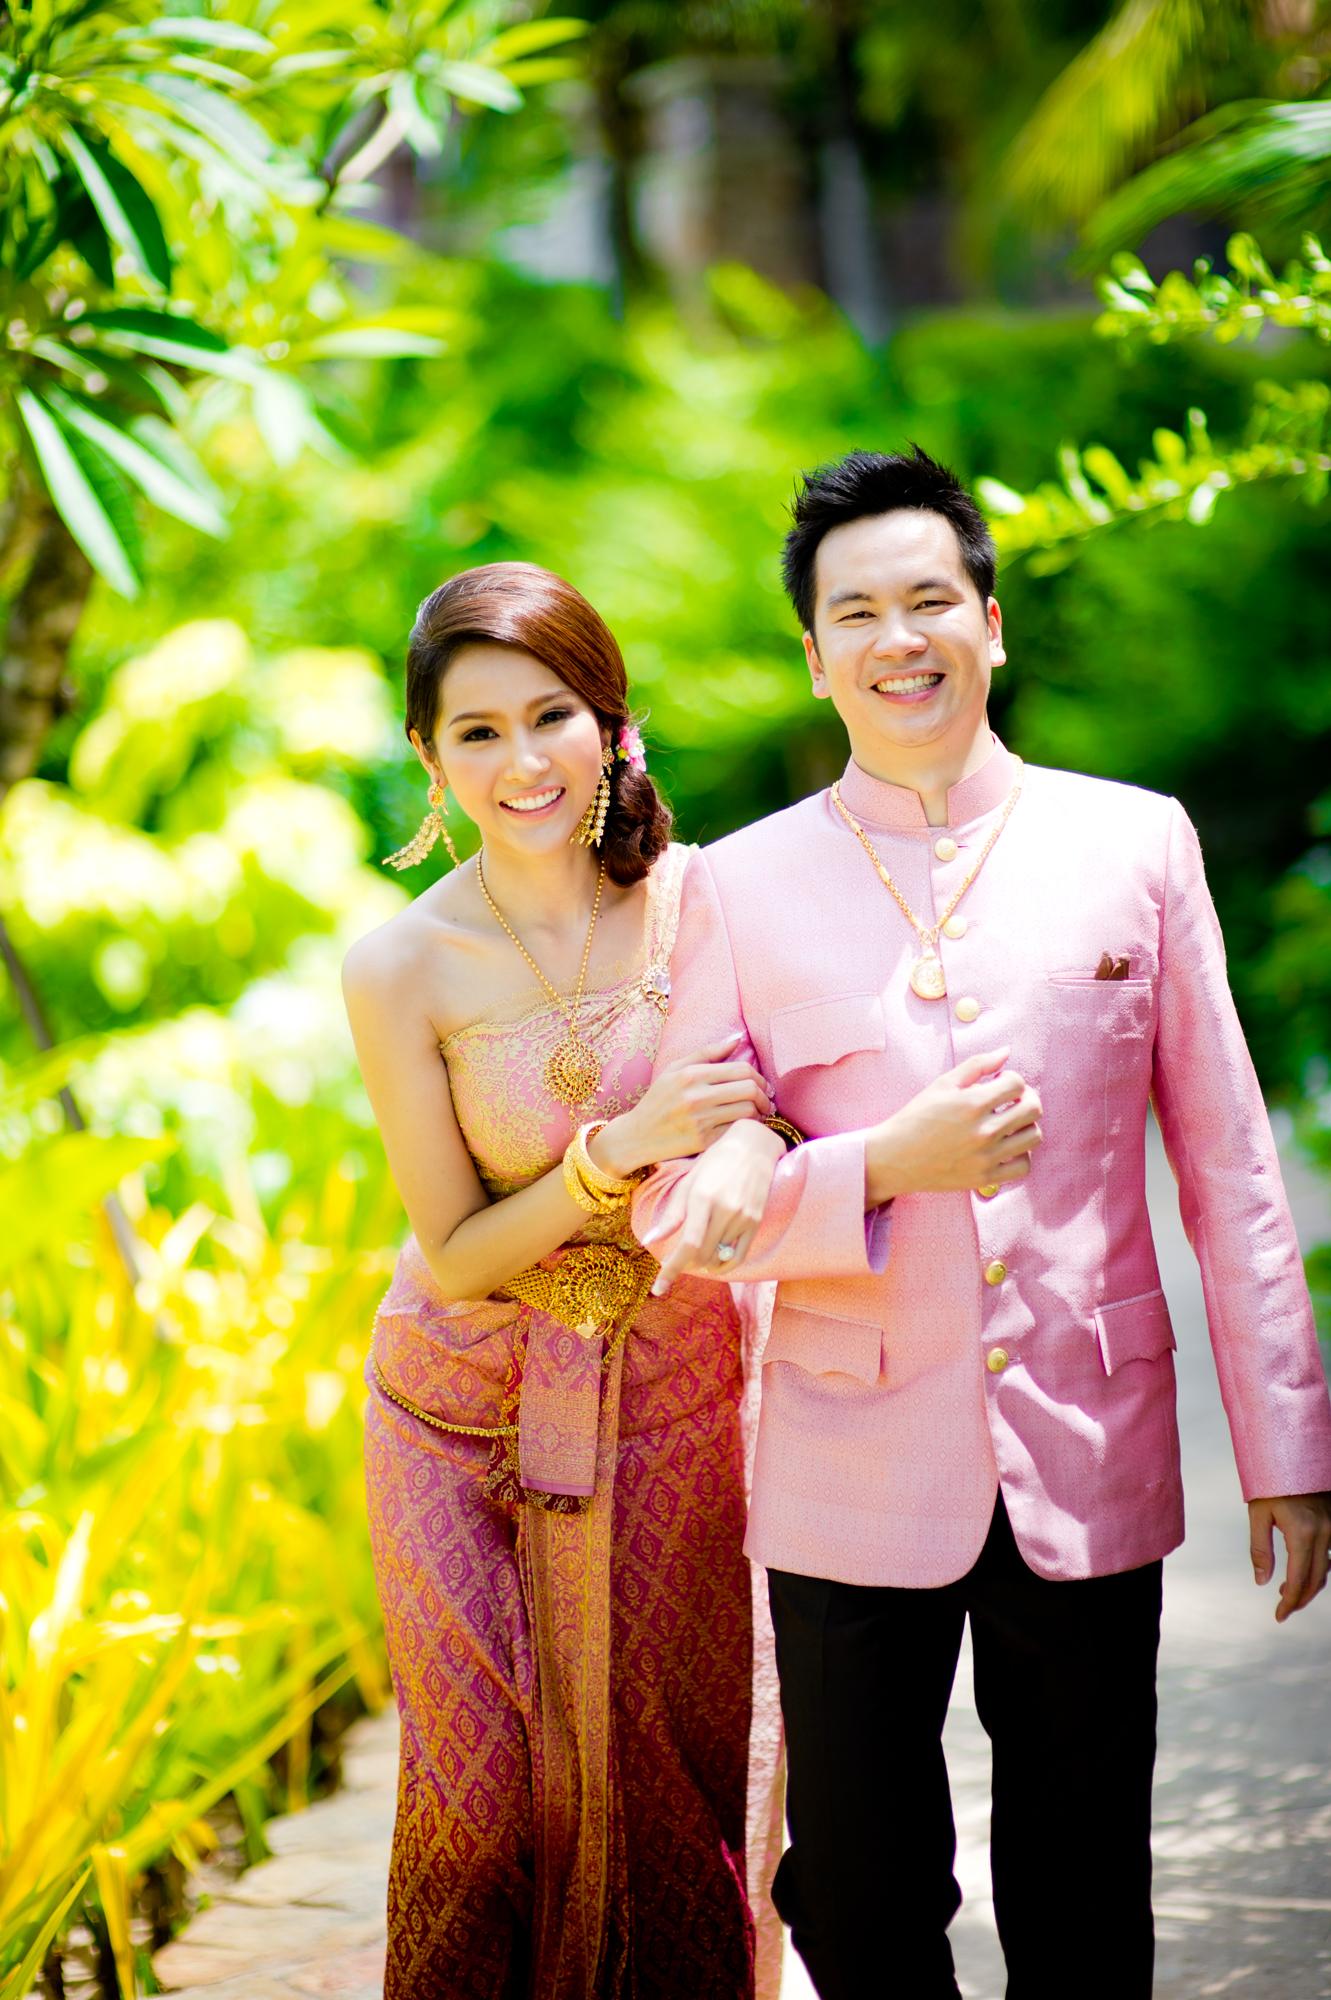 Wedding Pattaya Thailand